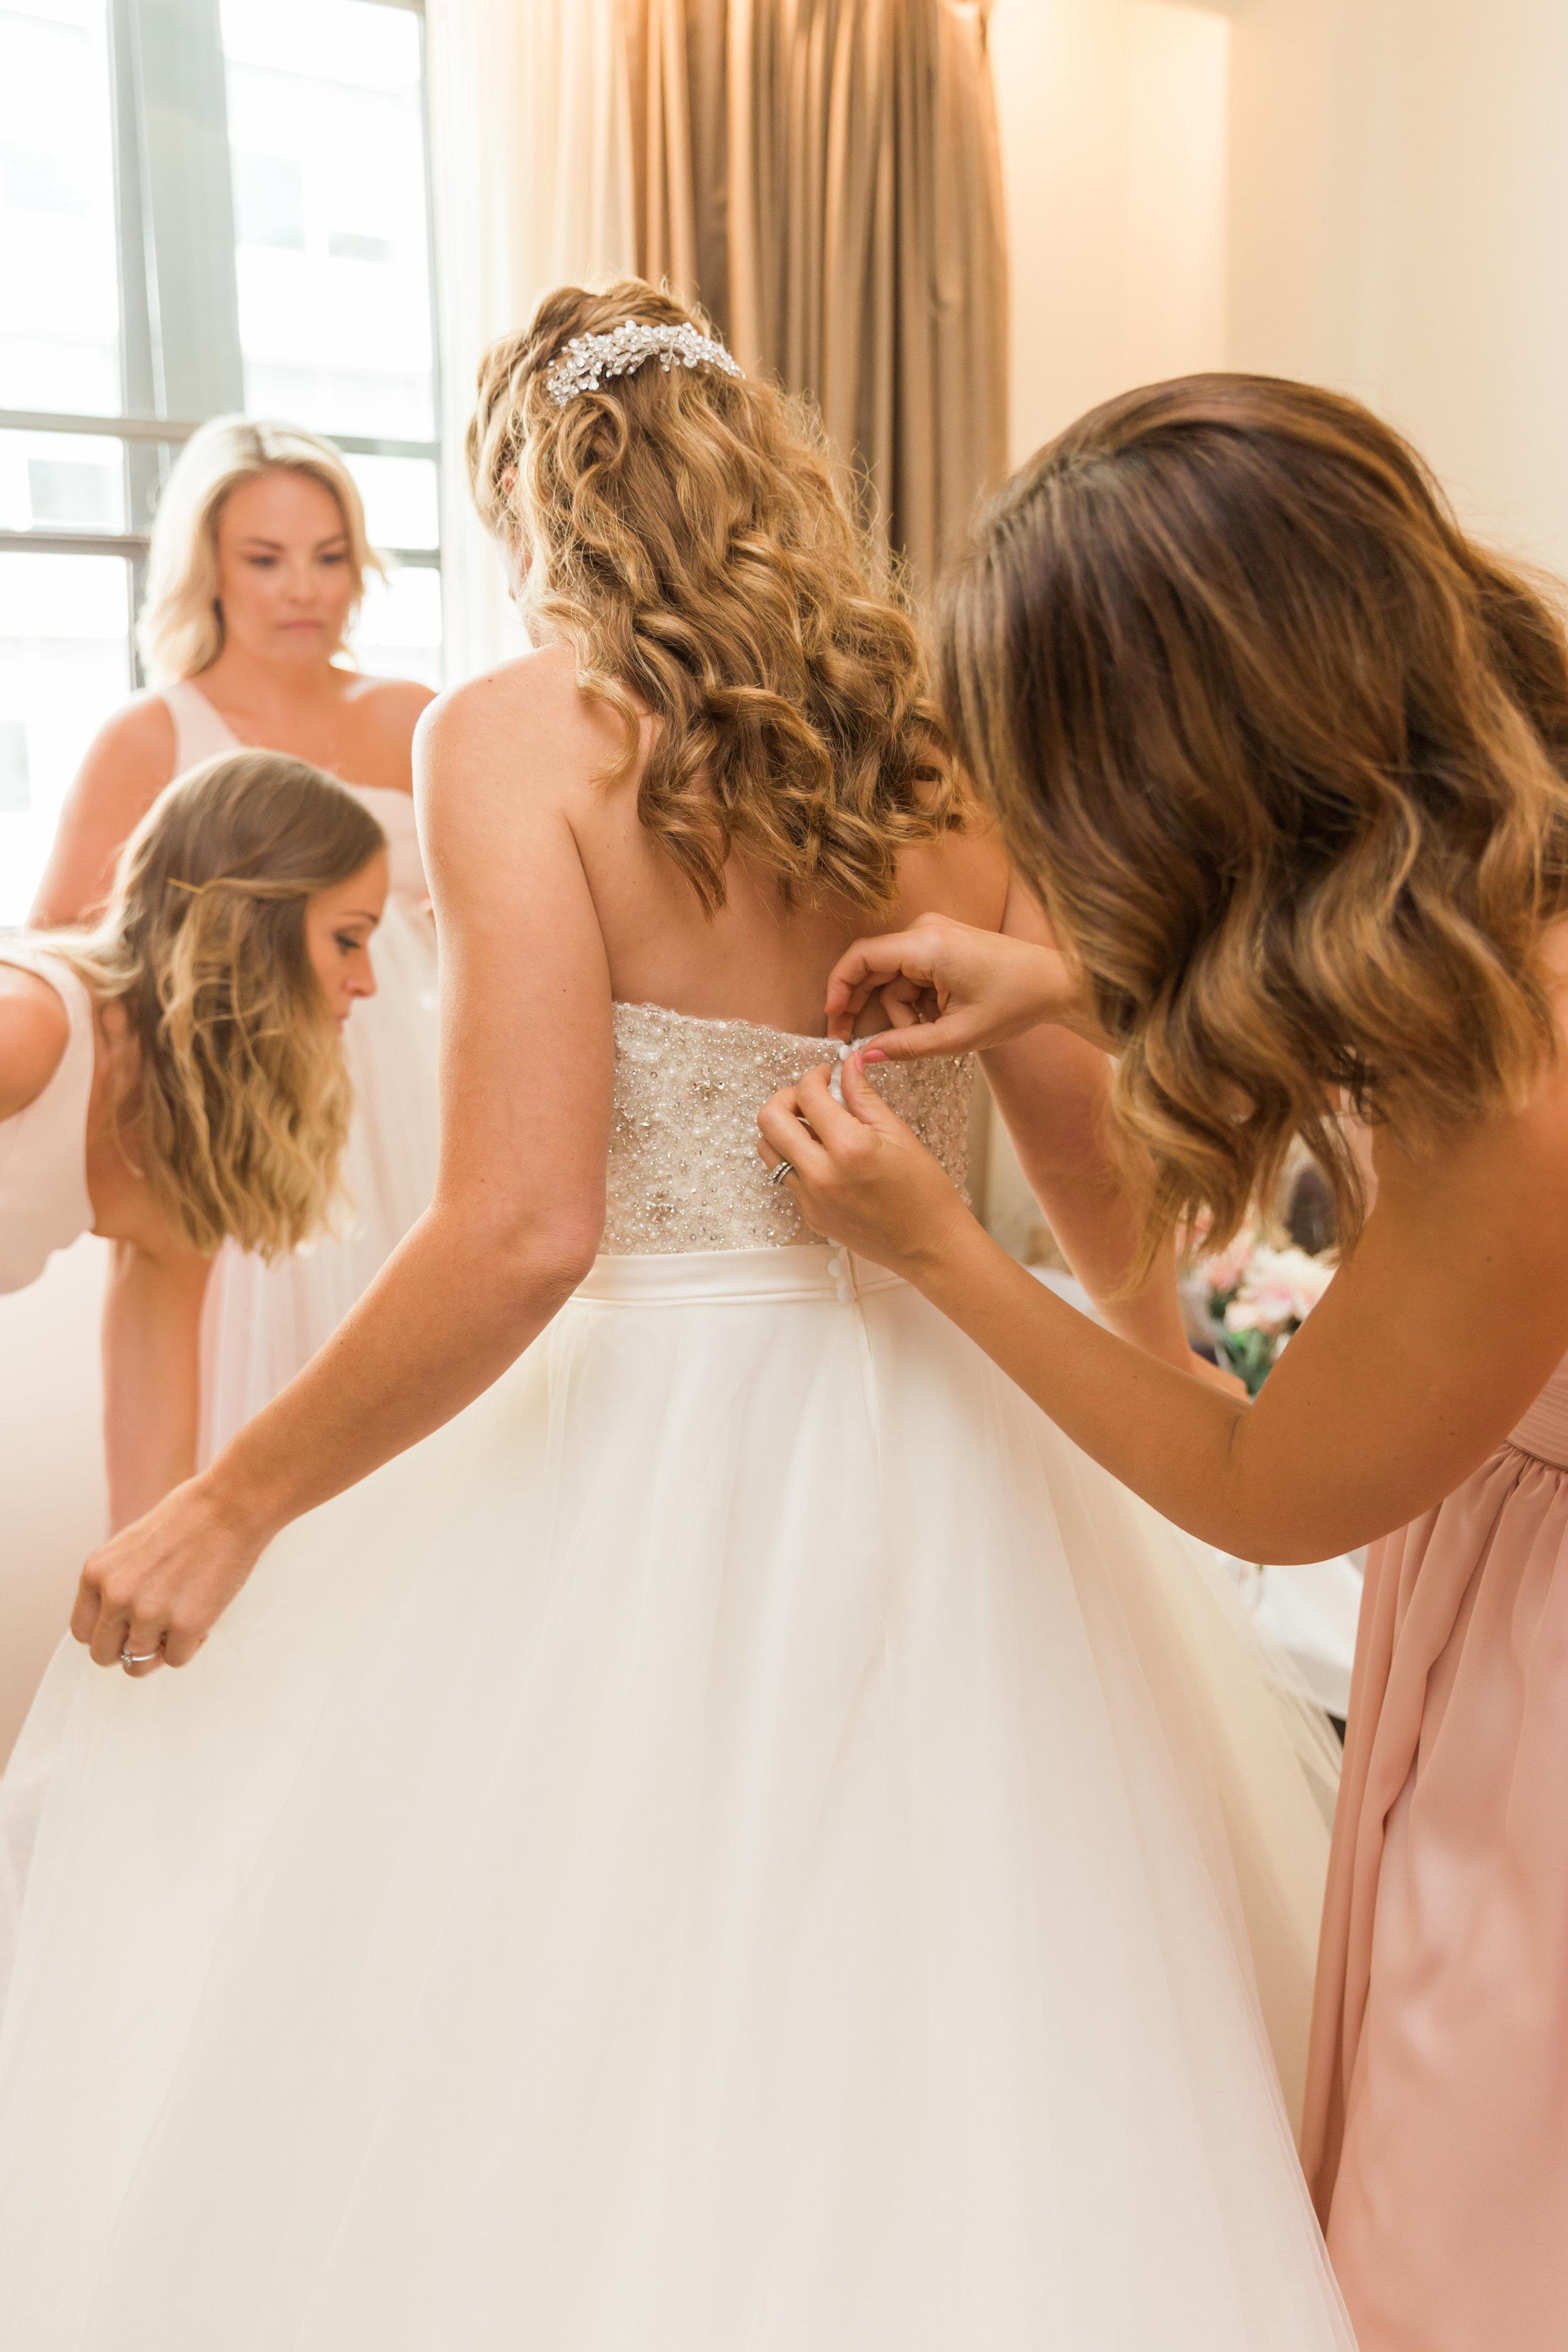 wedding day timeline.jpg